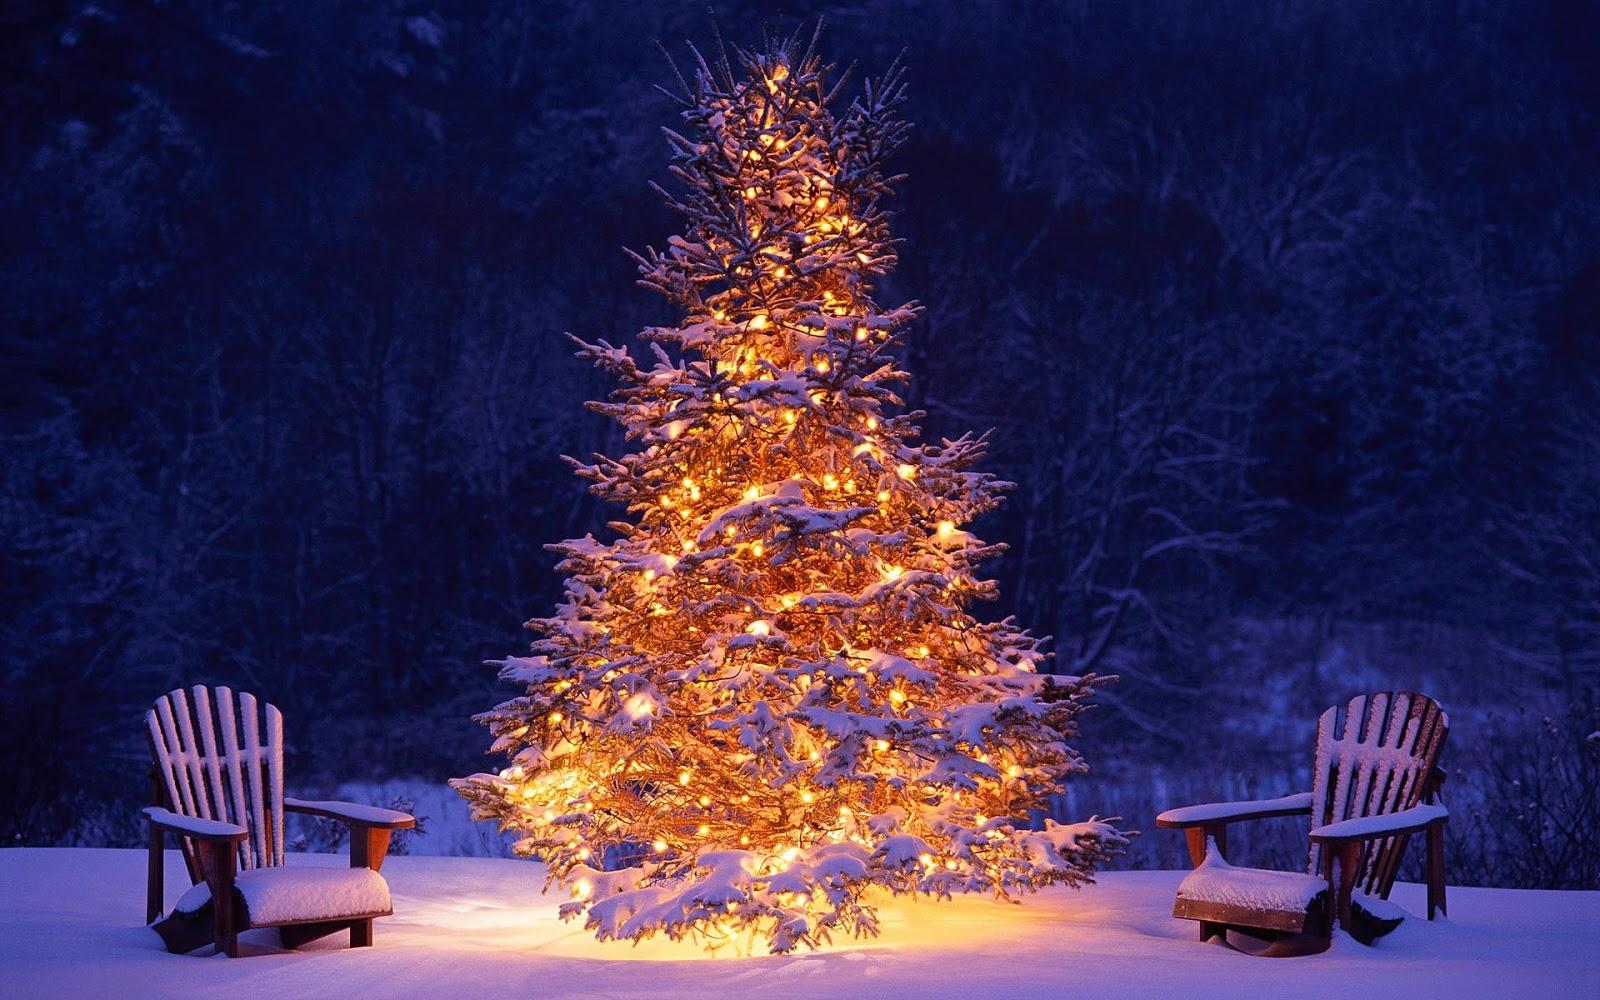 http://1.bp.blogspot.com/-R7QSczEc4AI/UMYwBk7pMkI/AAAAAAAAAV8/o8XmIKJZIWA/s1600/mooie-brandende-kerstboom-buiten-in-de-sneeuw-hd-kerst-wallpaper.jpg